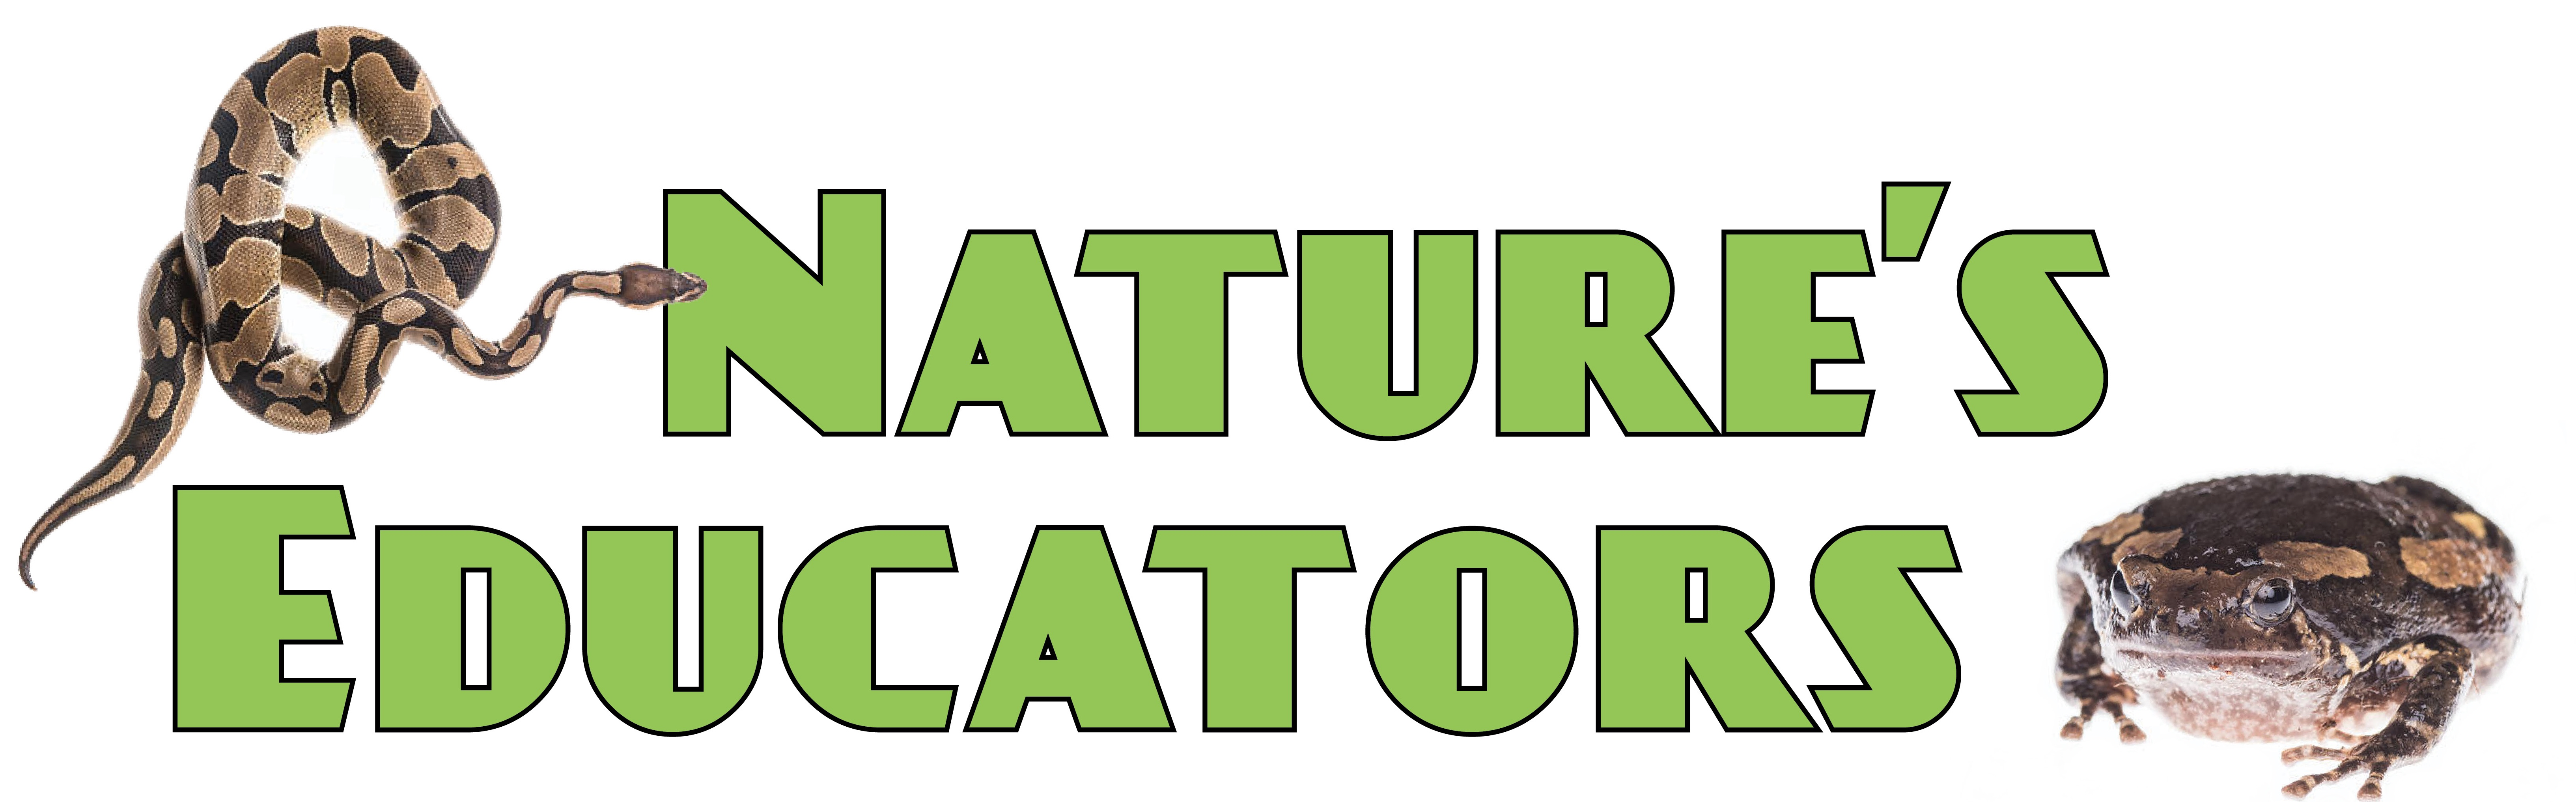 Nature's Educators